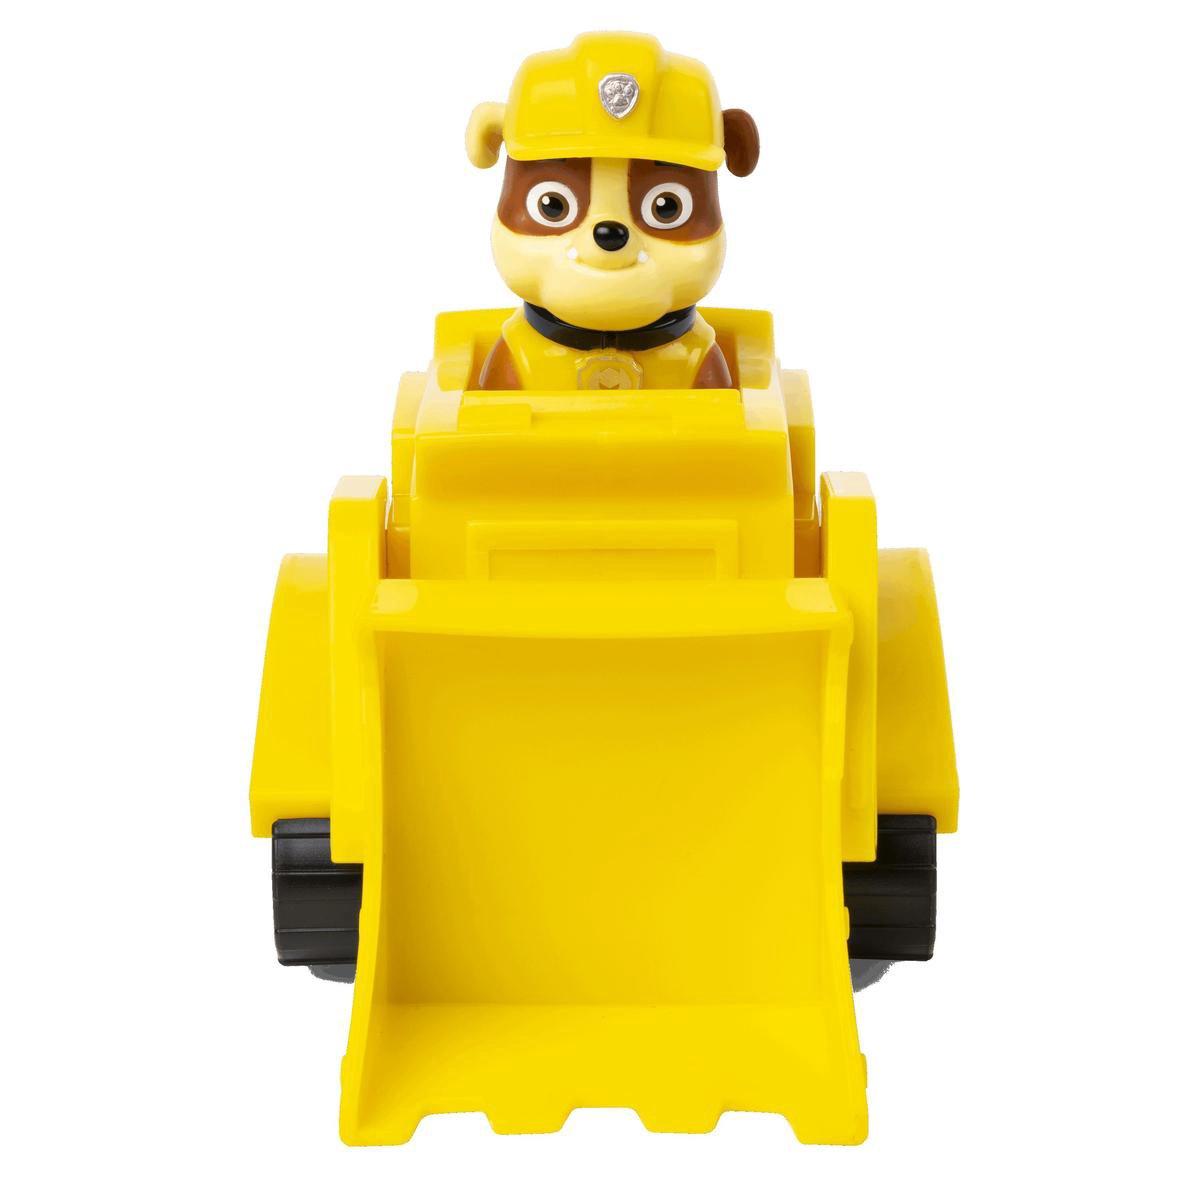 PAW Patrol Bulldozer met Rubble